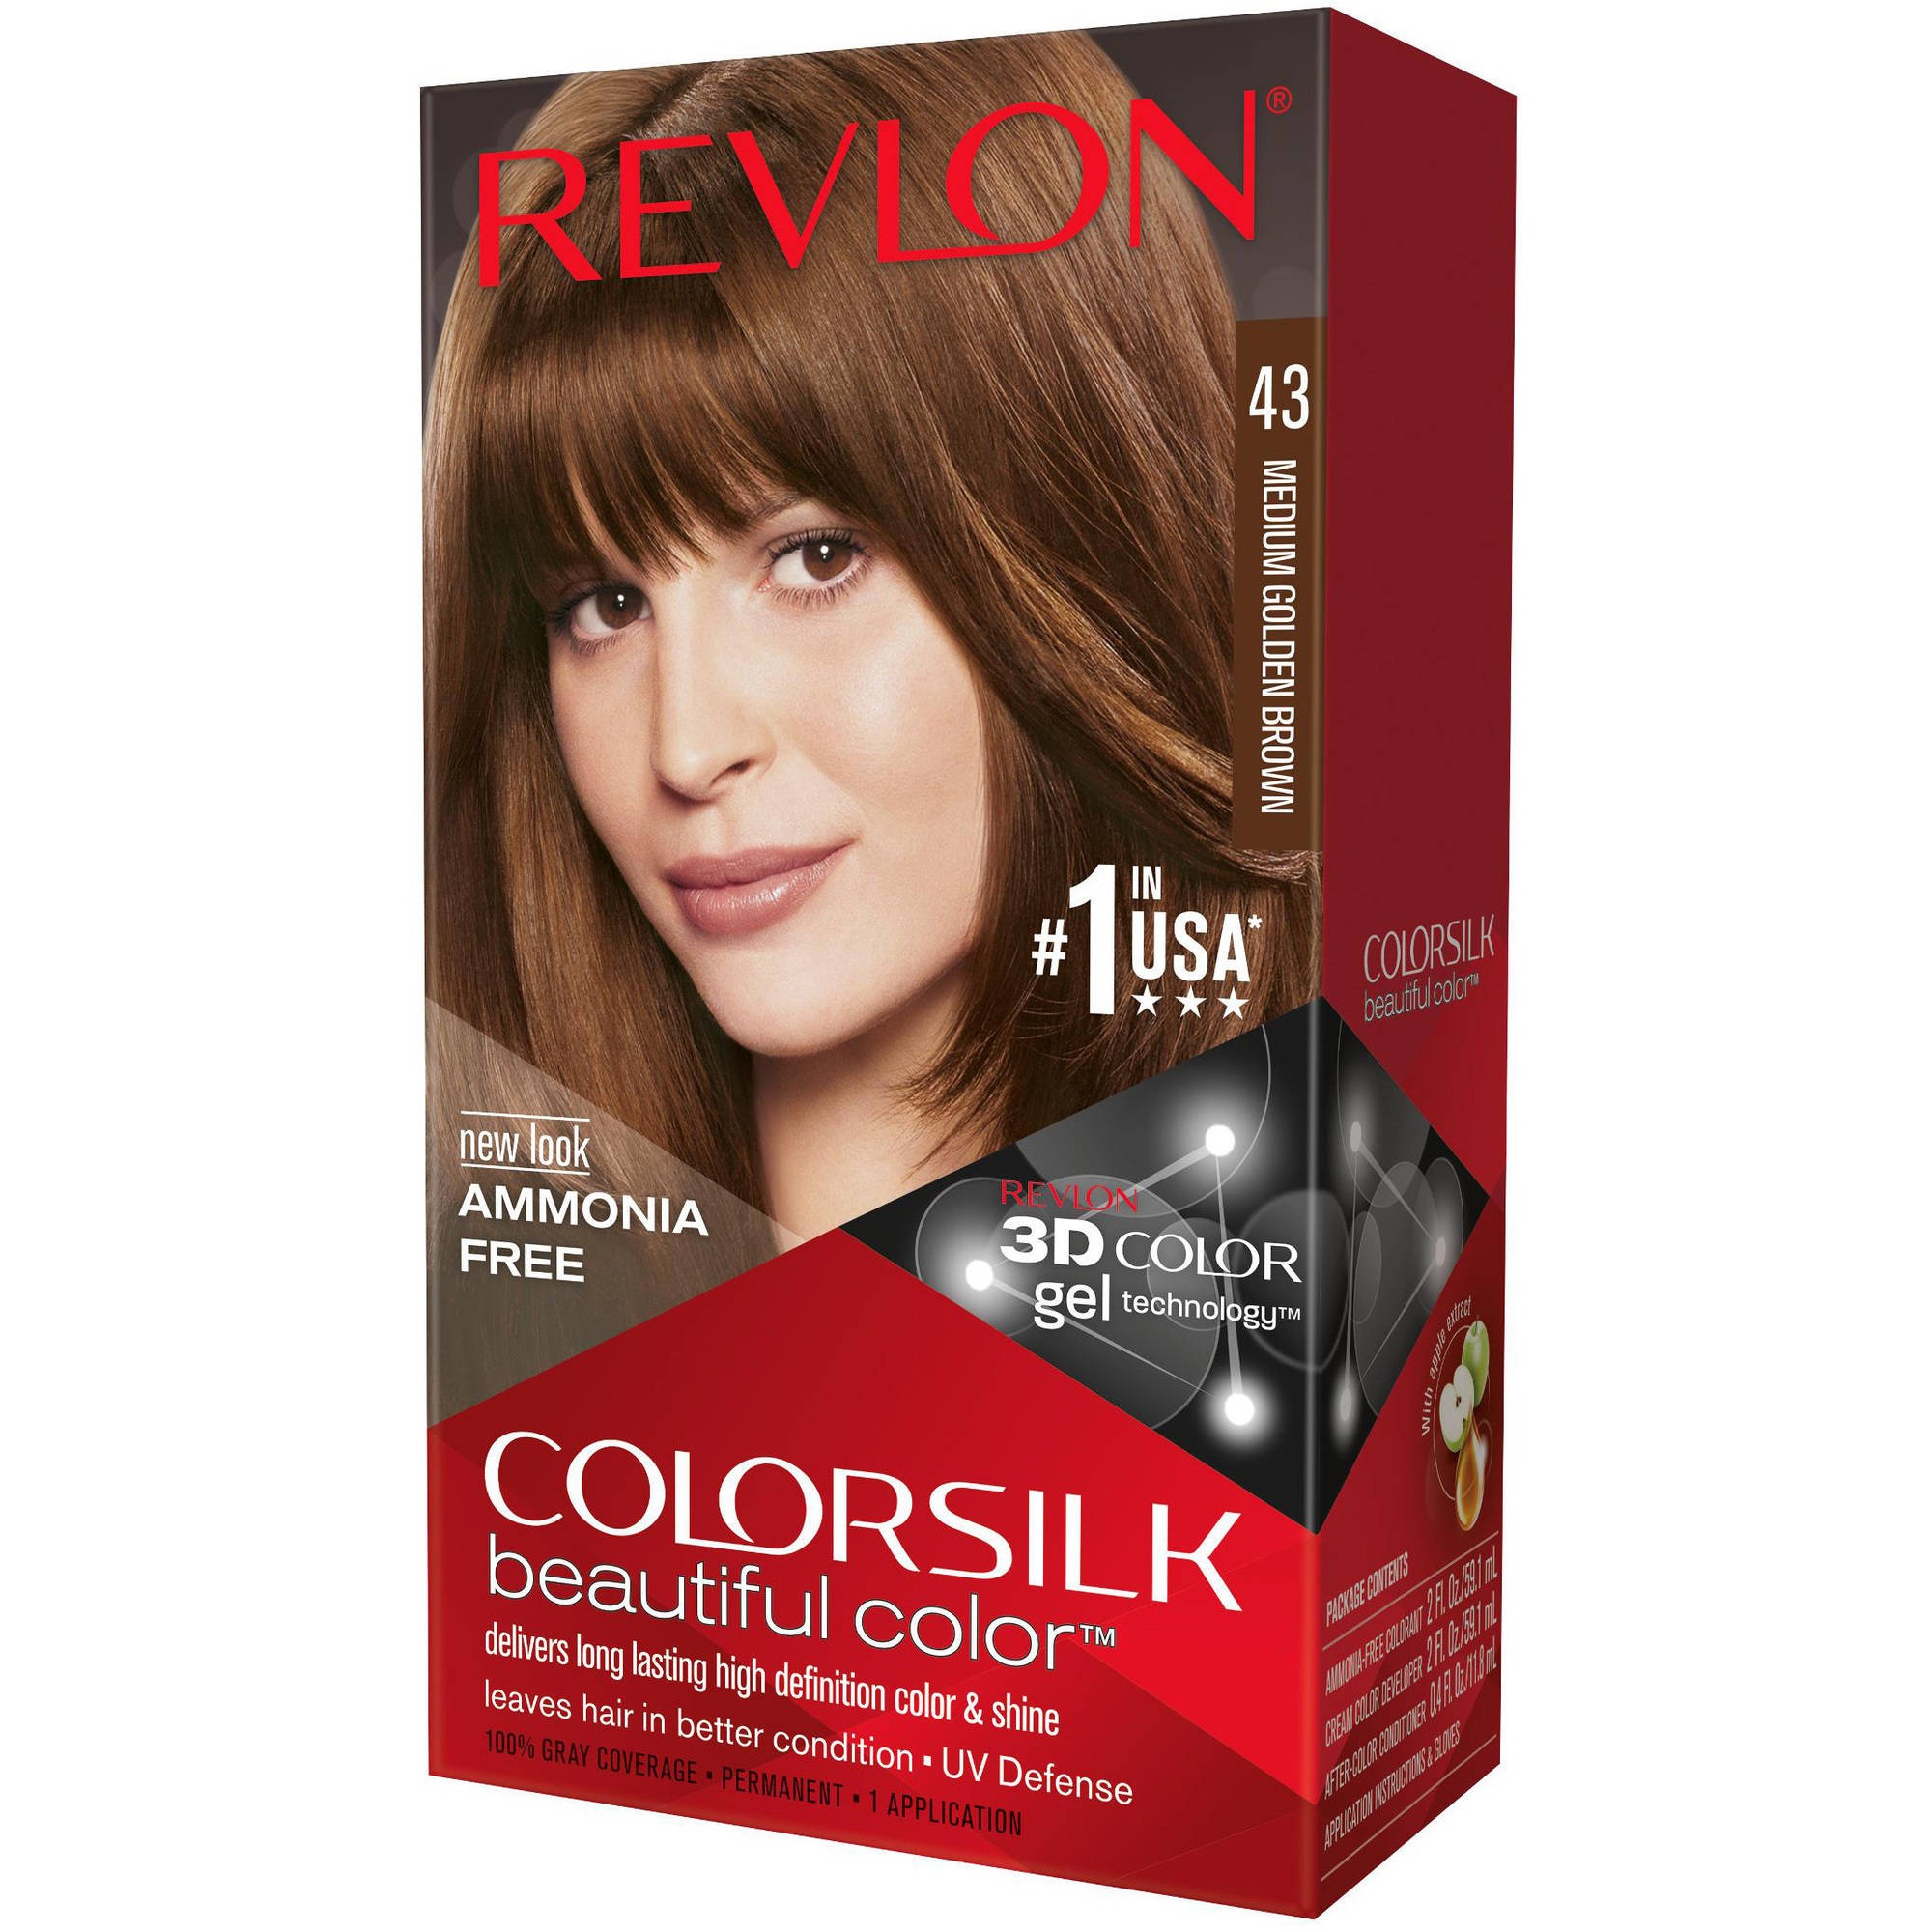 Revlon Colorsilk Beautiful Color Permanent Hair Color, 43 Medium Golden Brown